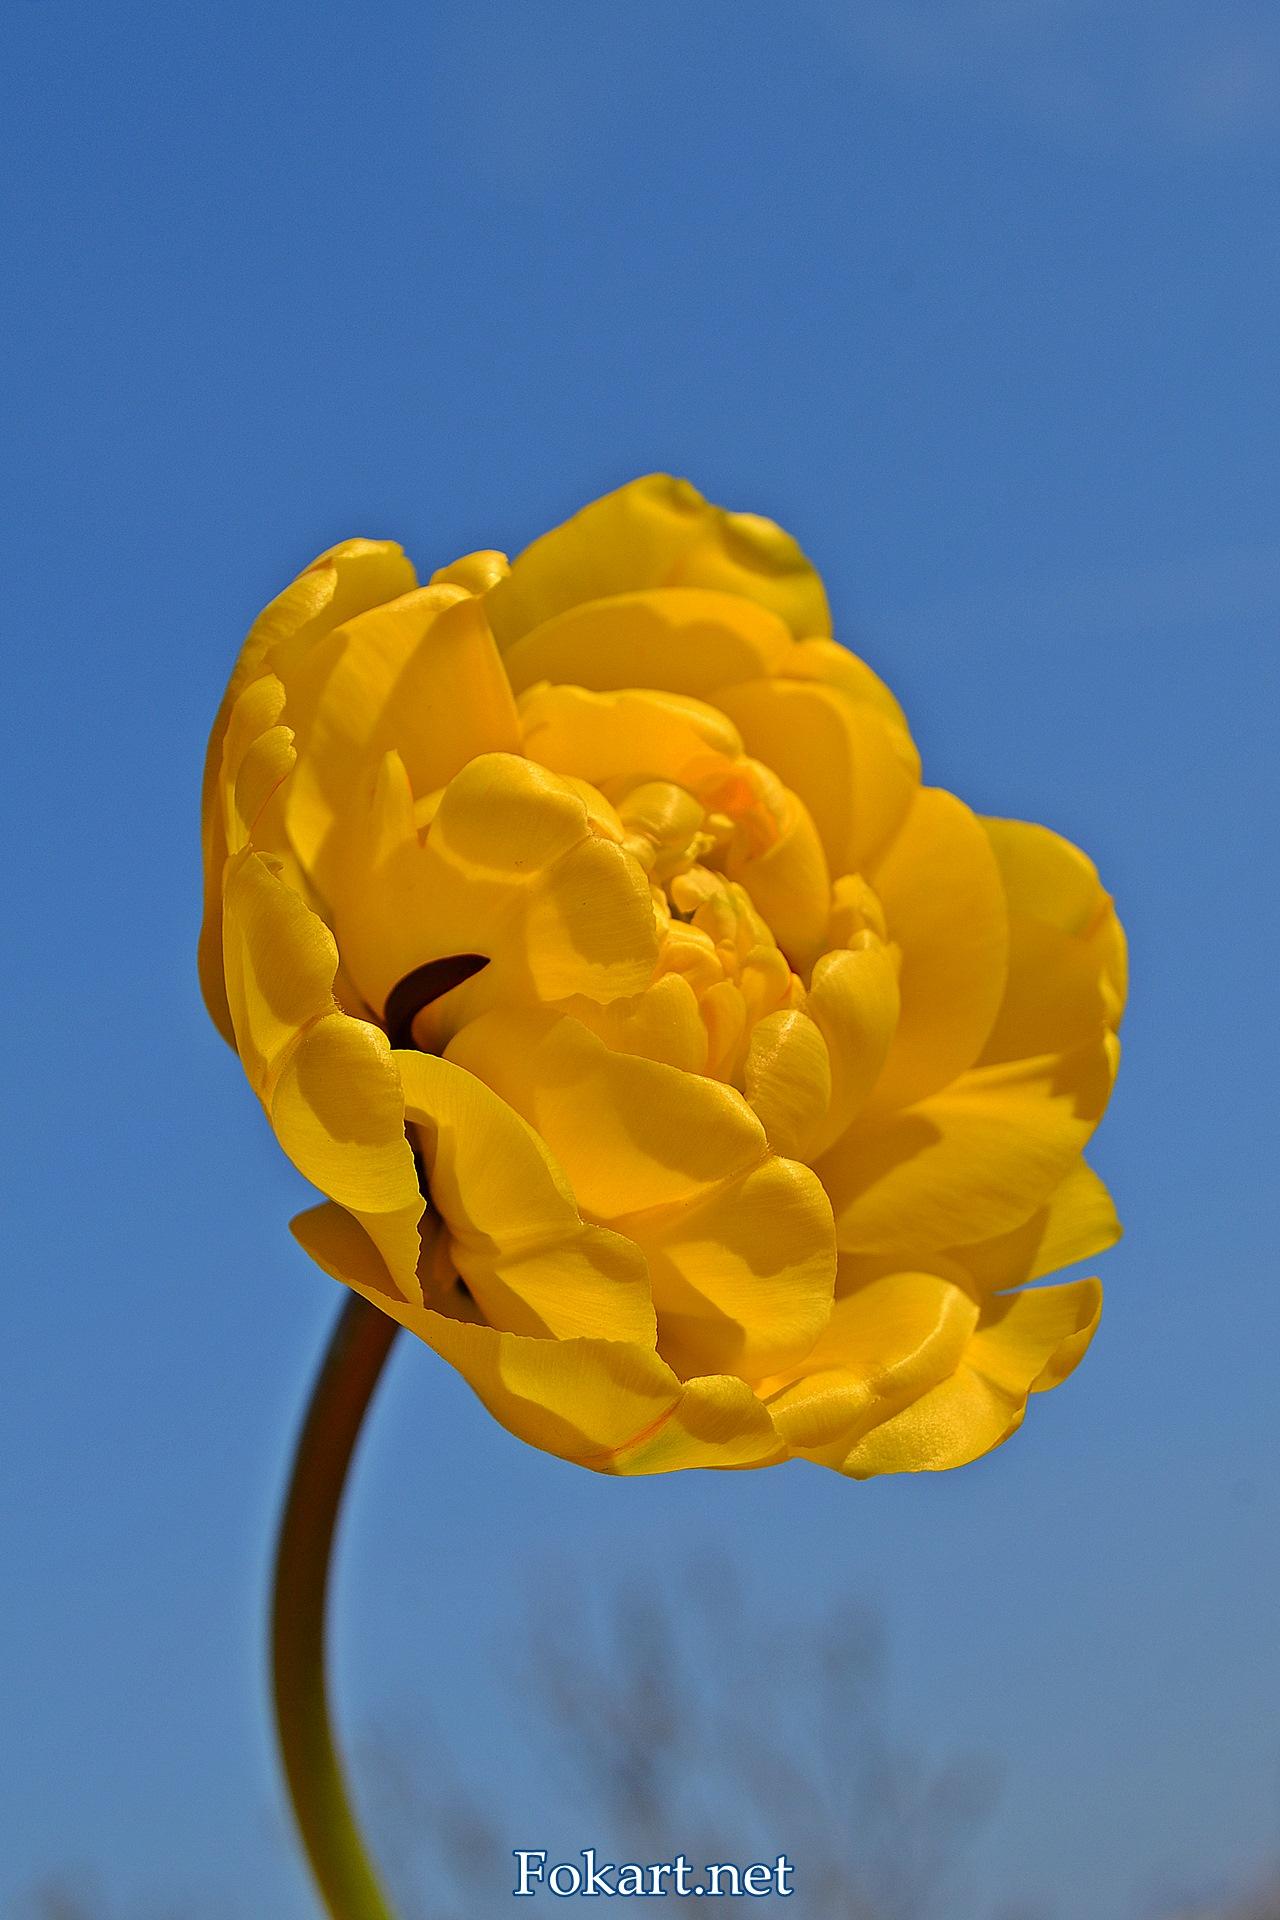 Жёлтый махровый тюльпан на фоне неба